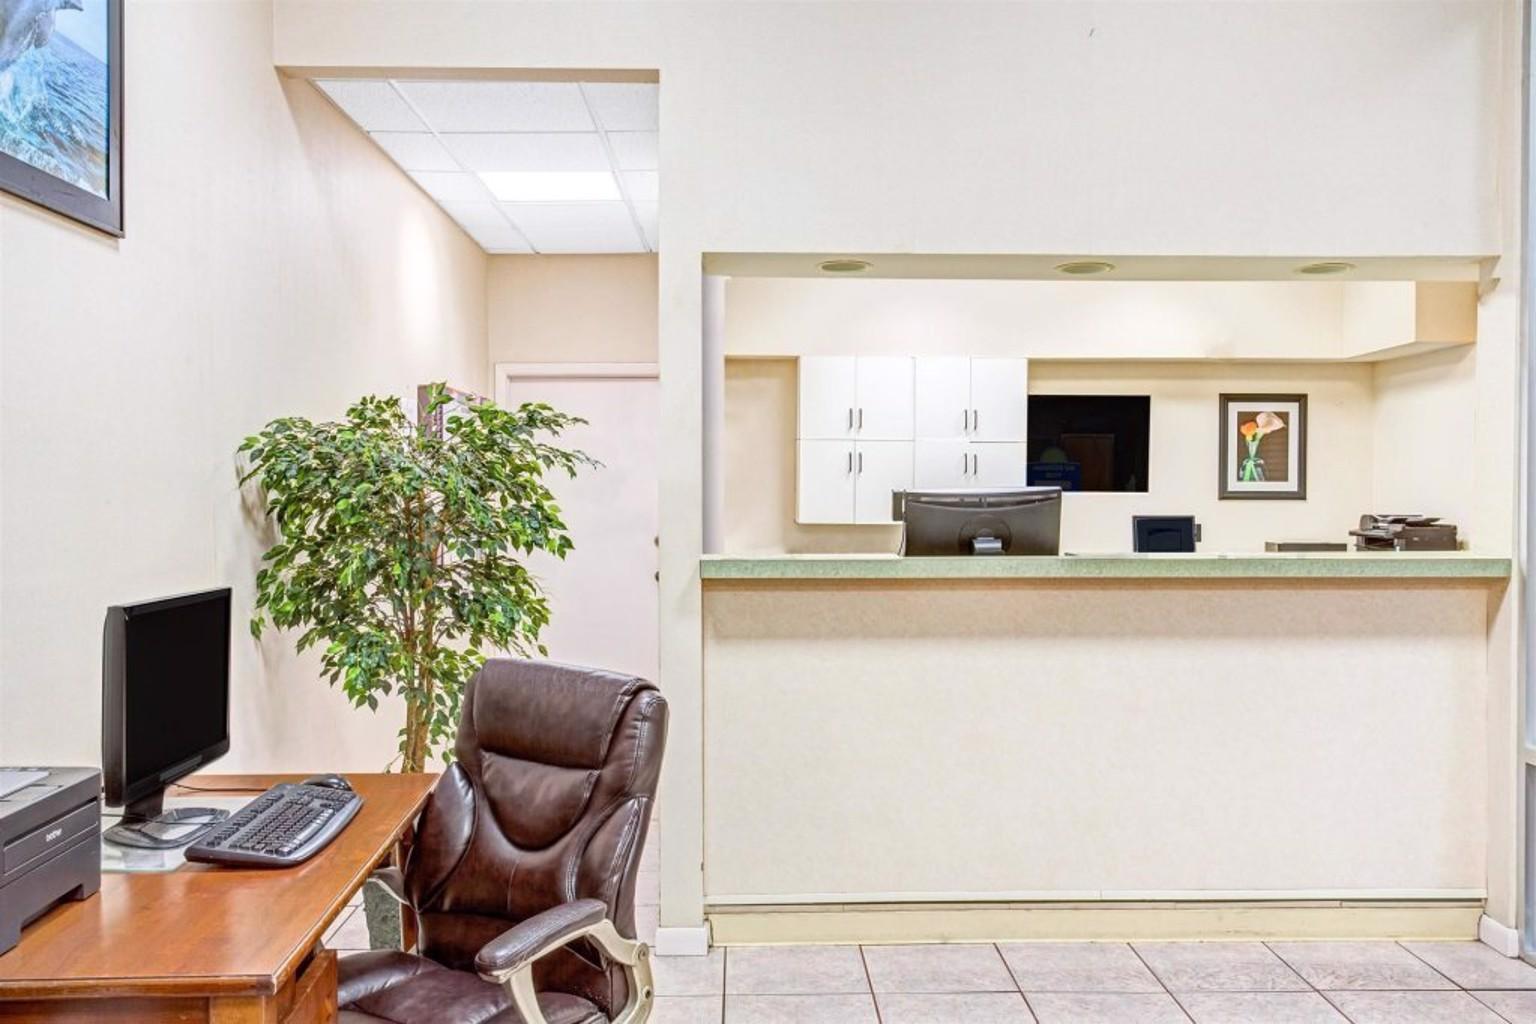 Gallery image of Days Inn Sanford